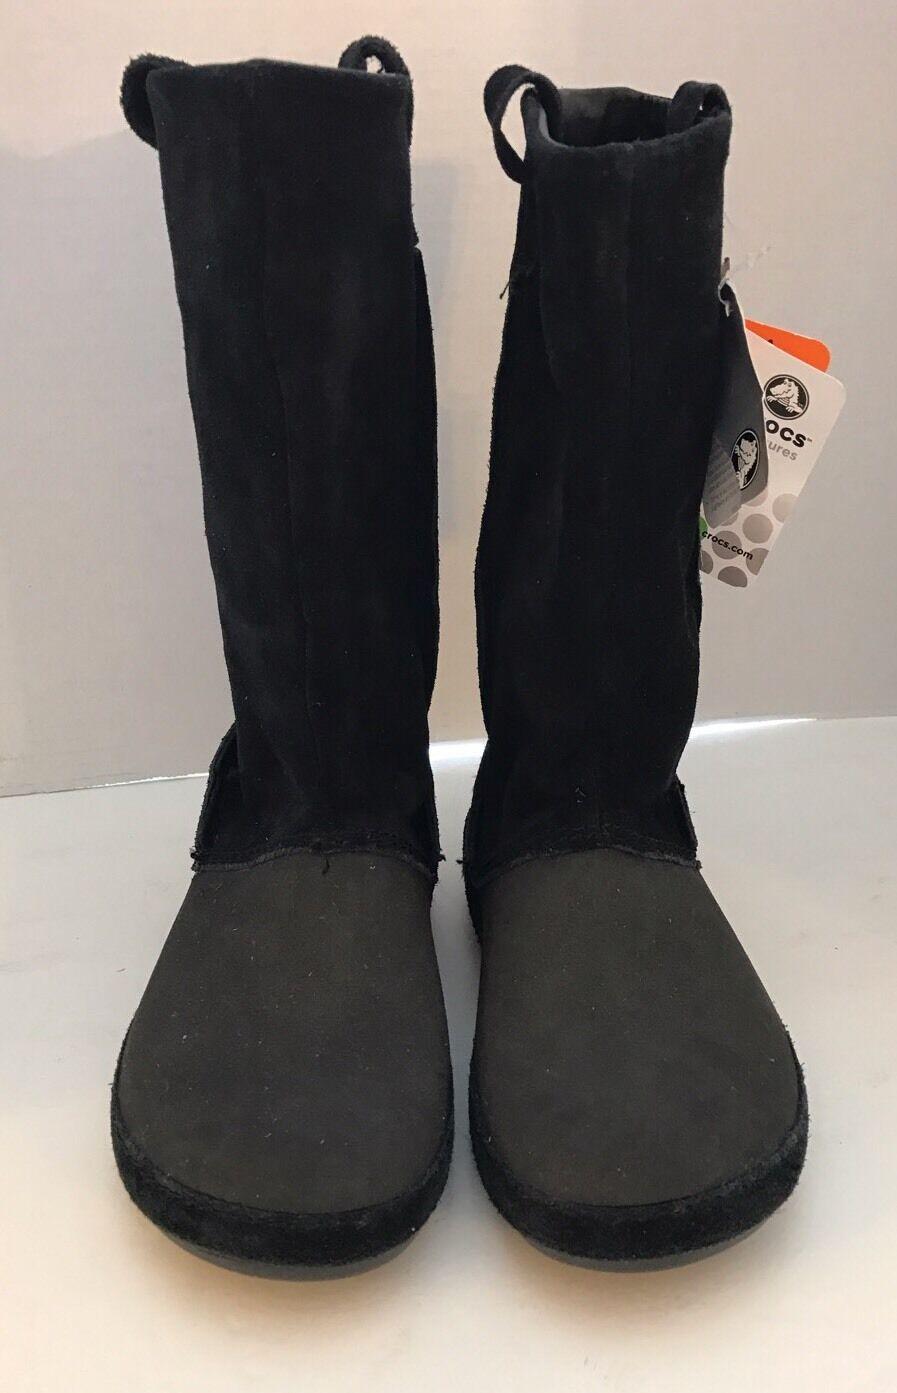 New Crocs Berryessa Boots Black Leather Suede  Suede Women Boots Sz 4